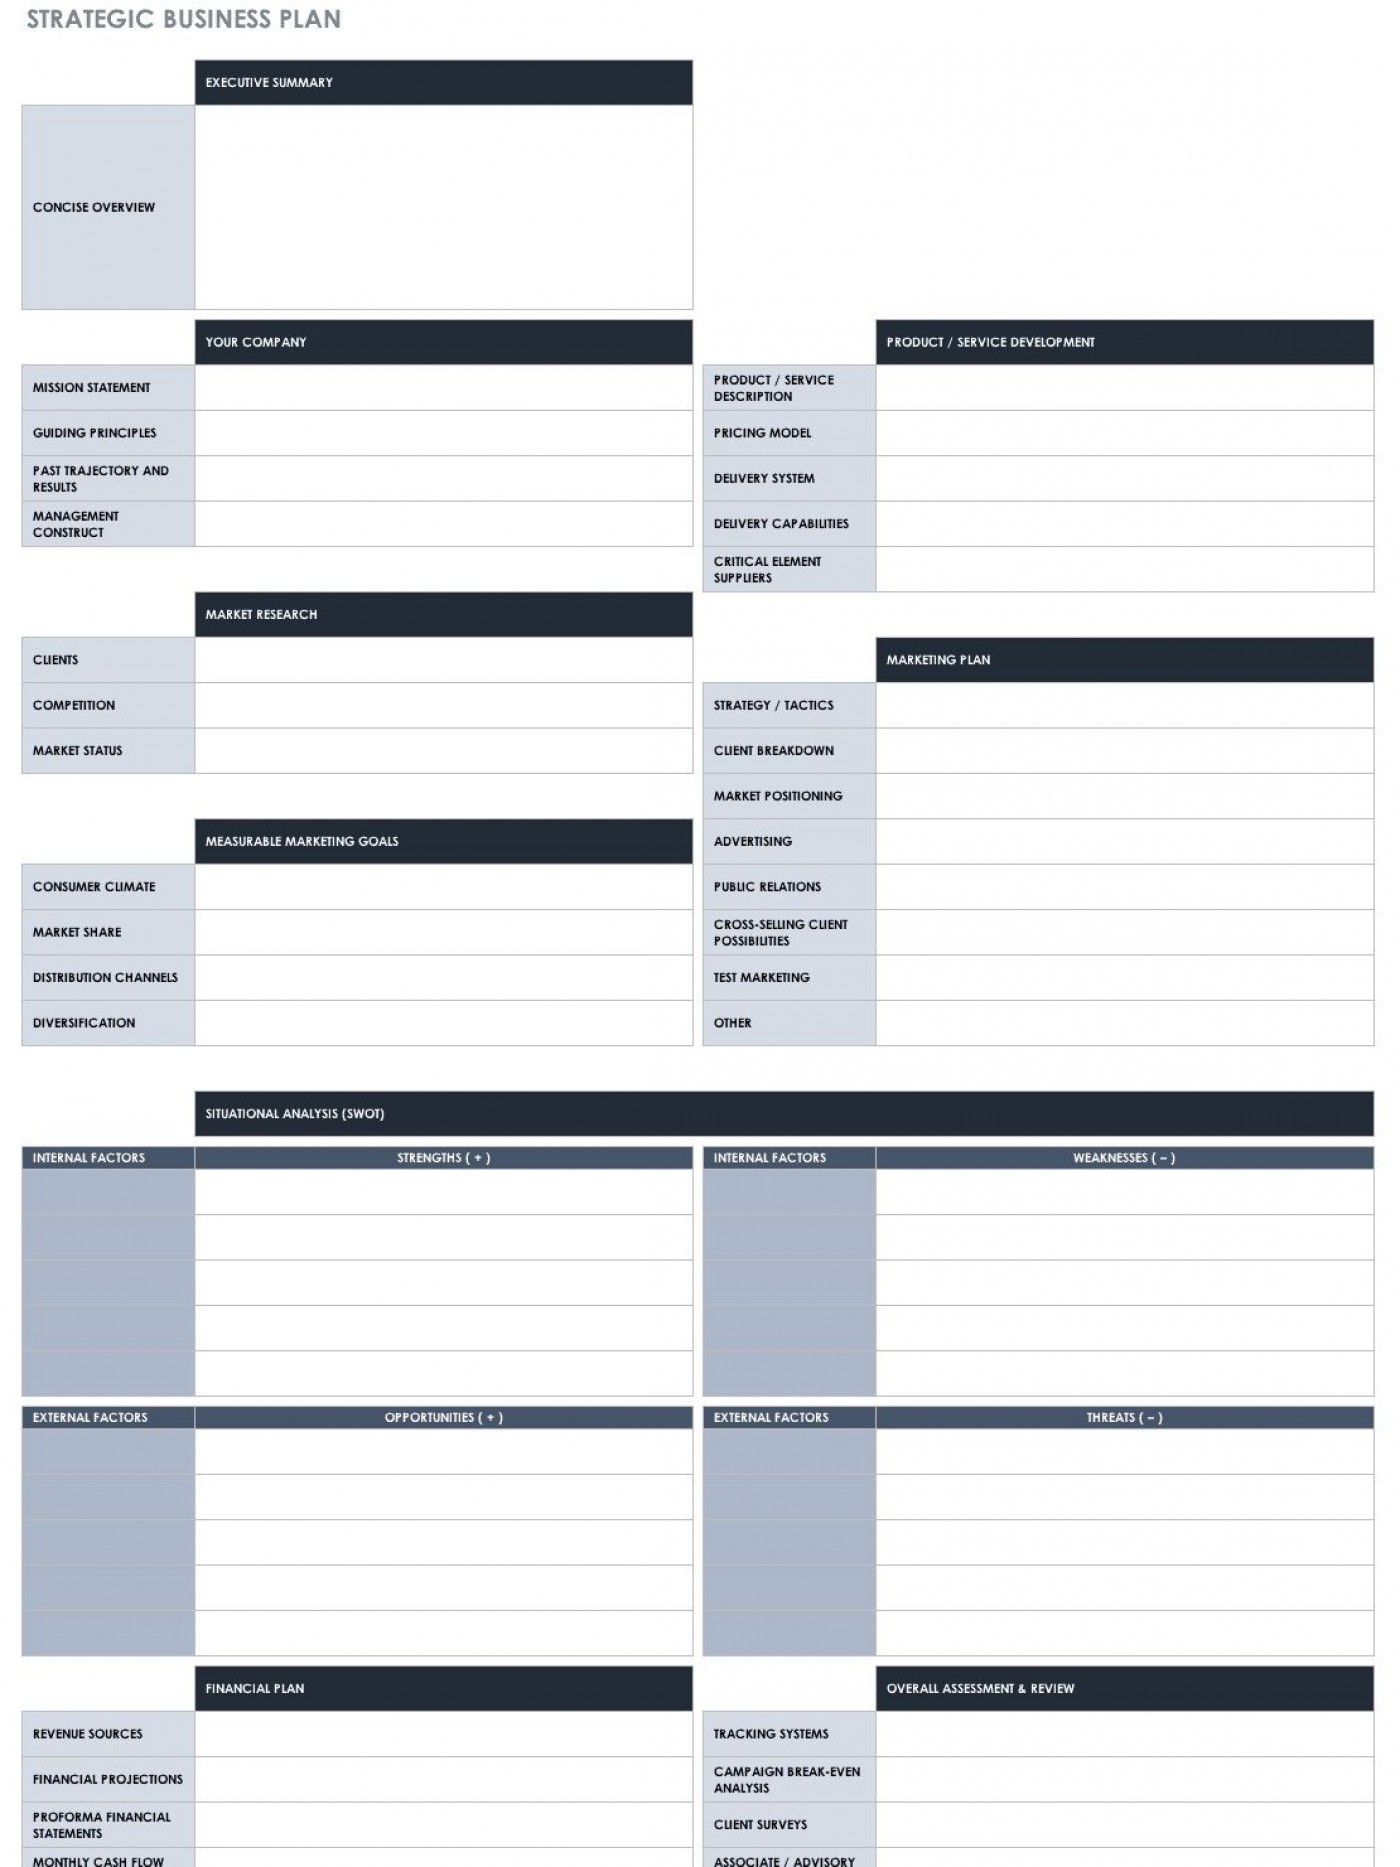 007 Impressive Strategic Busines Plan Template Highest Quality  Development Word Sample1400